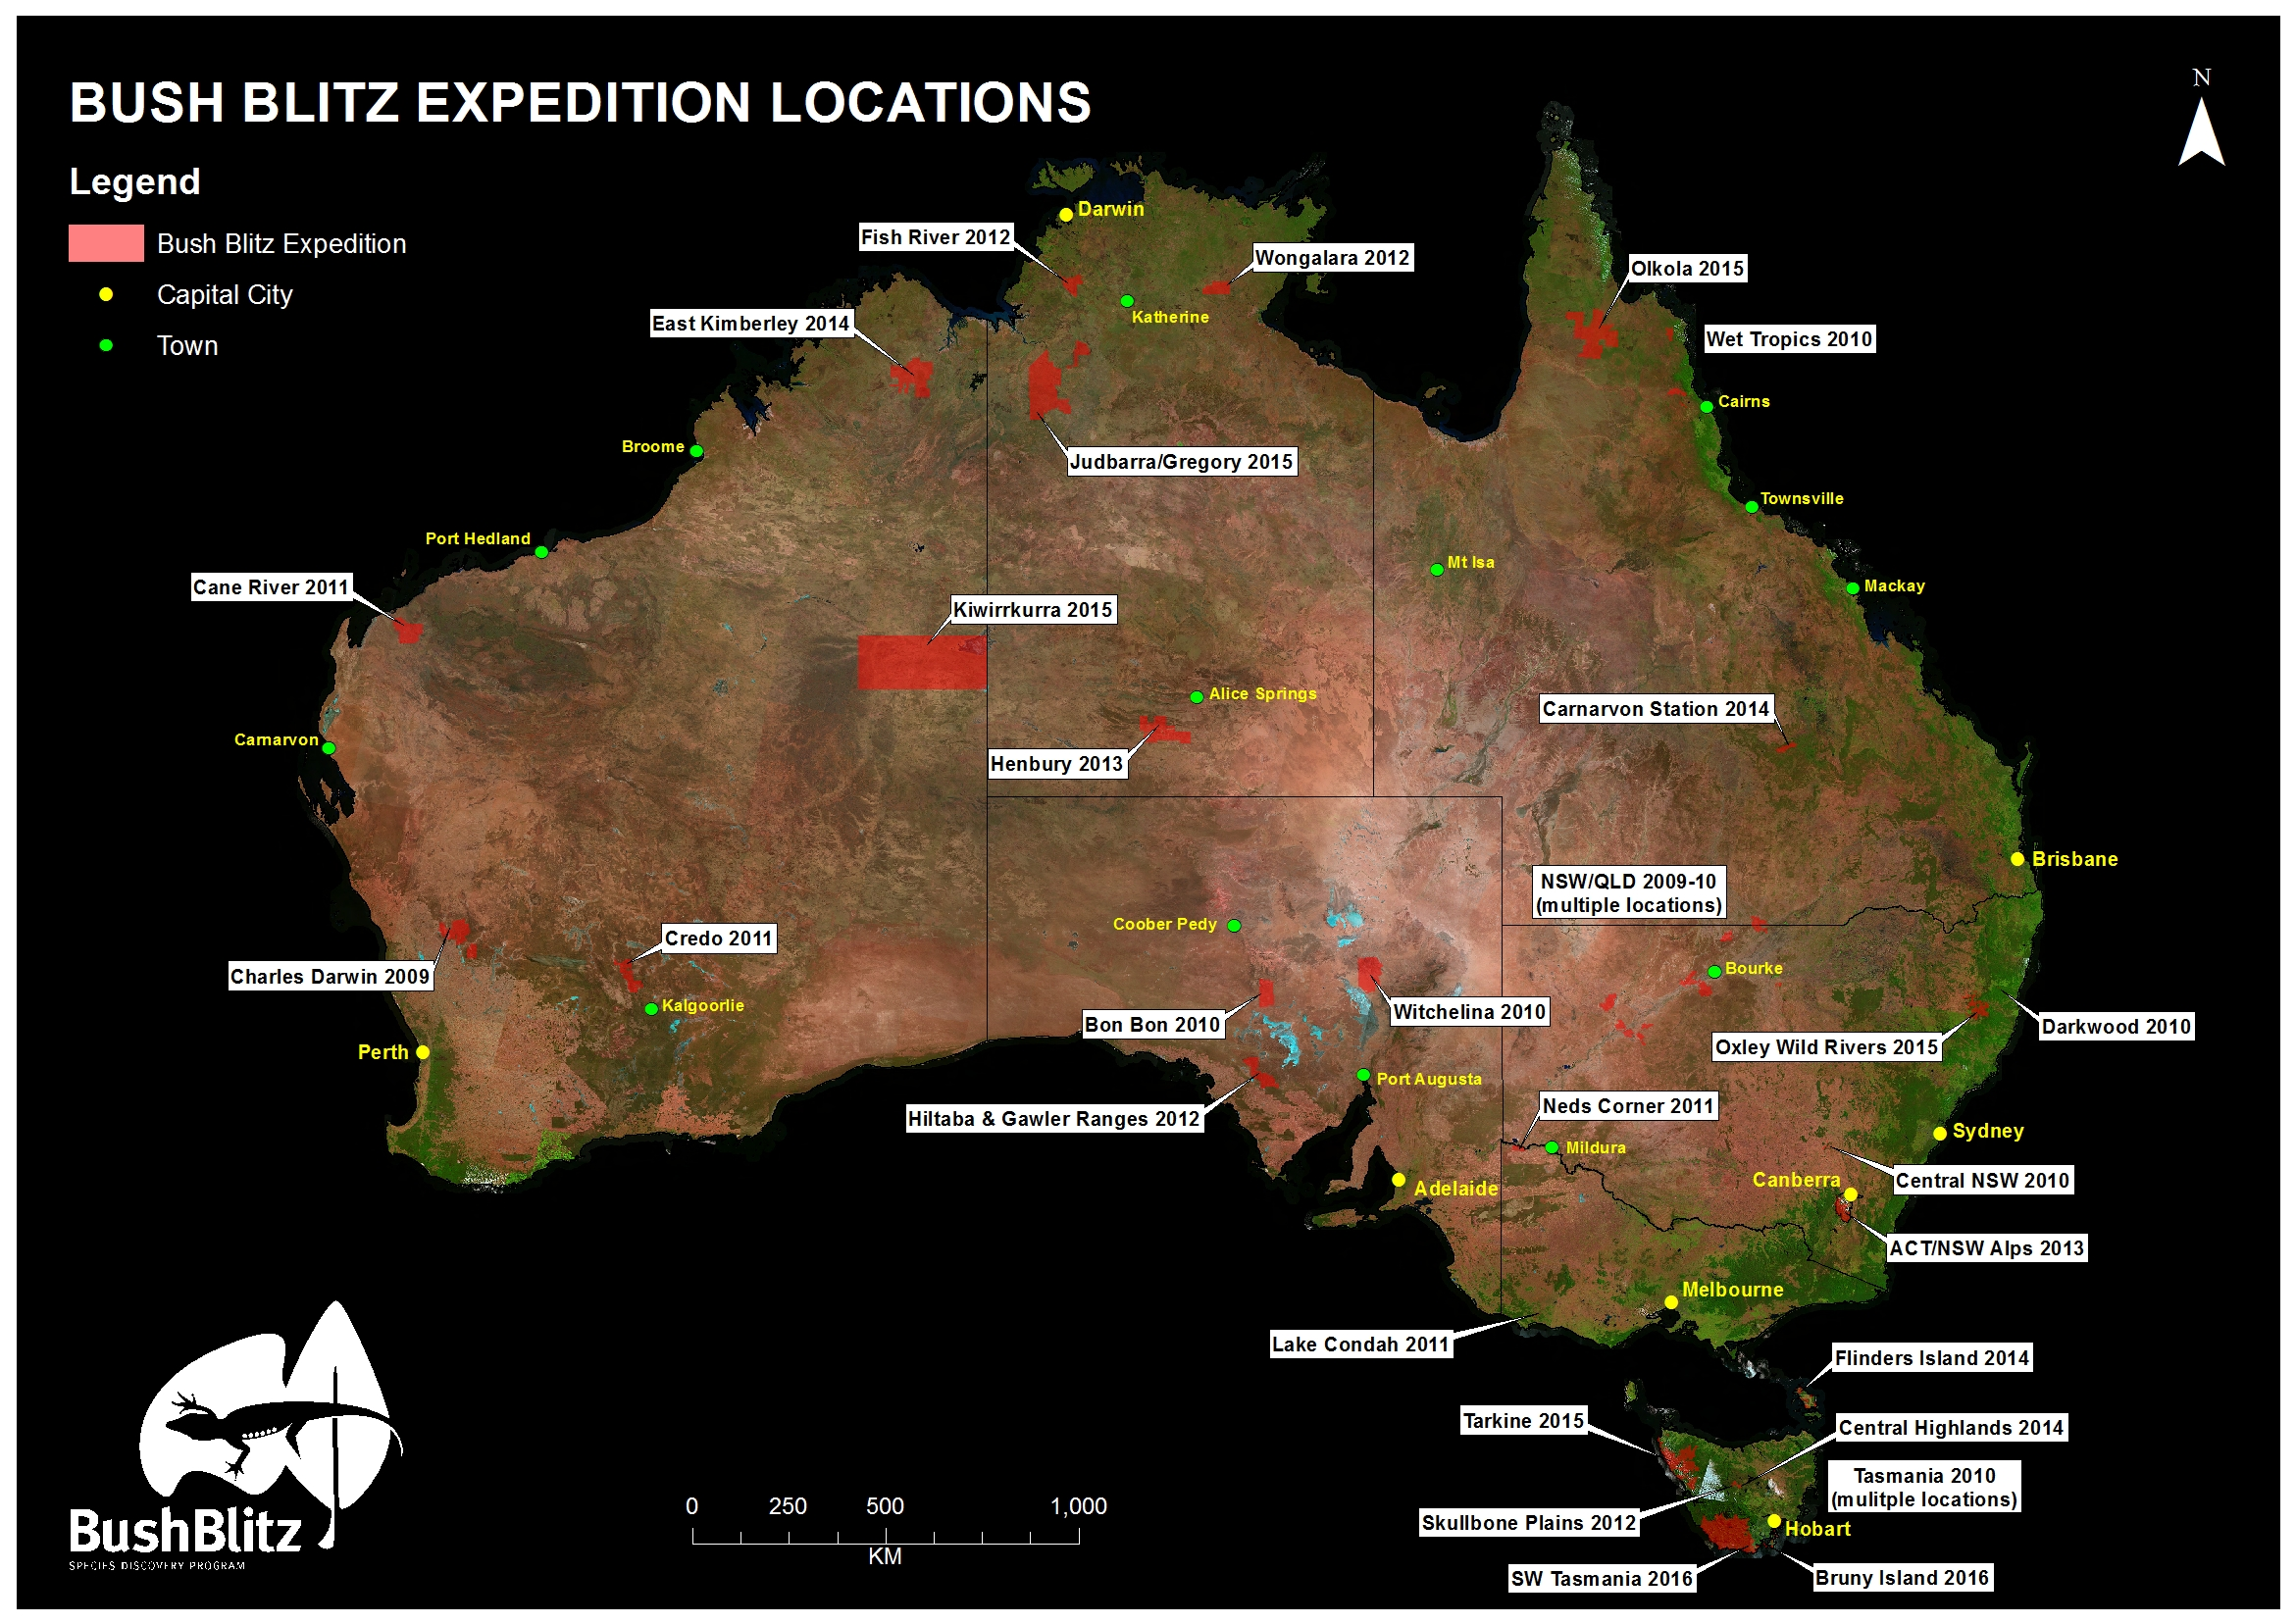 Bush Blitz locations as of March 2016 A0 satellite 50 dpi